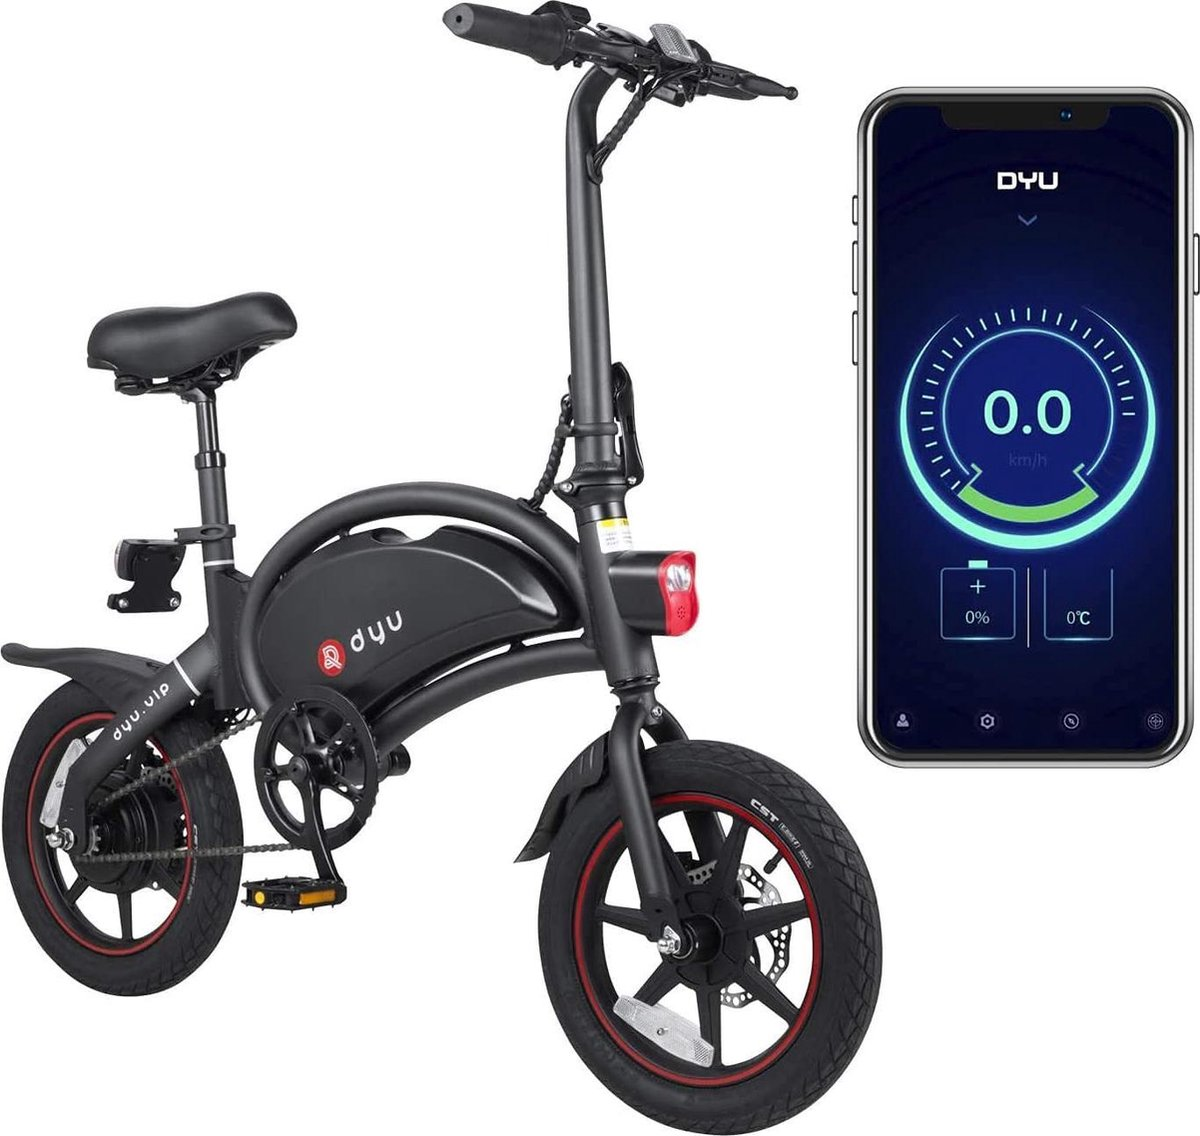 DYU - E-Bike D3+ - Elektrische fiets - Smart bike - met App - Opvouwbaar - 350W / 42V / 10Ah - 3 Ver